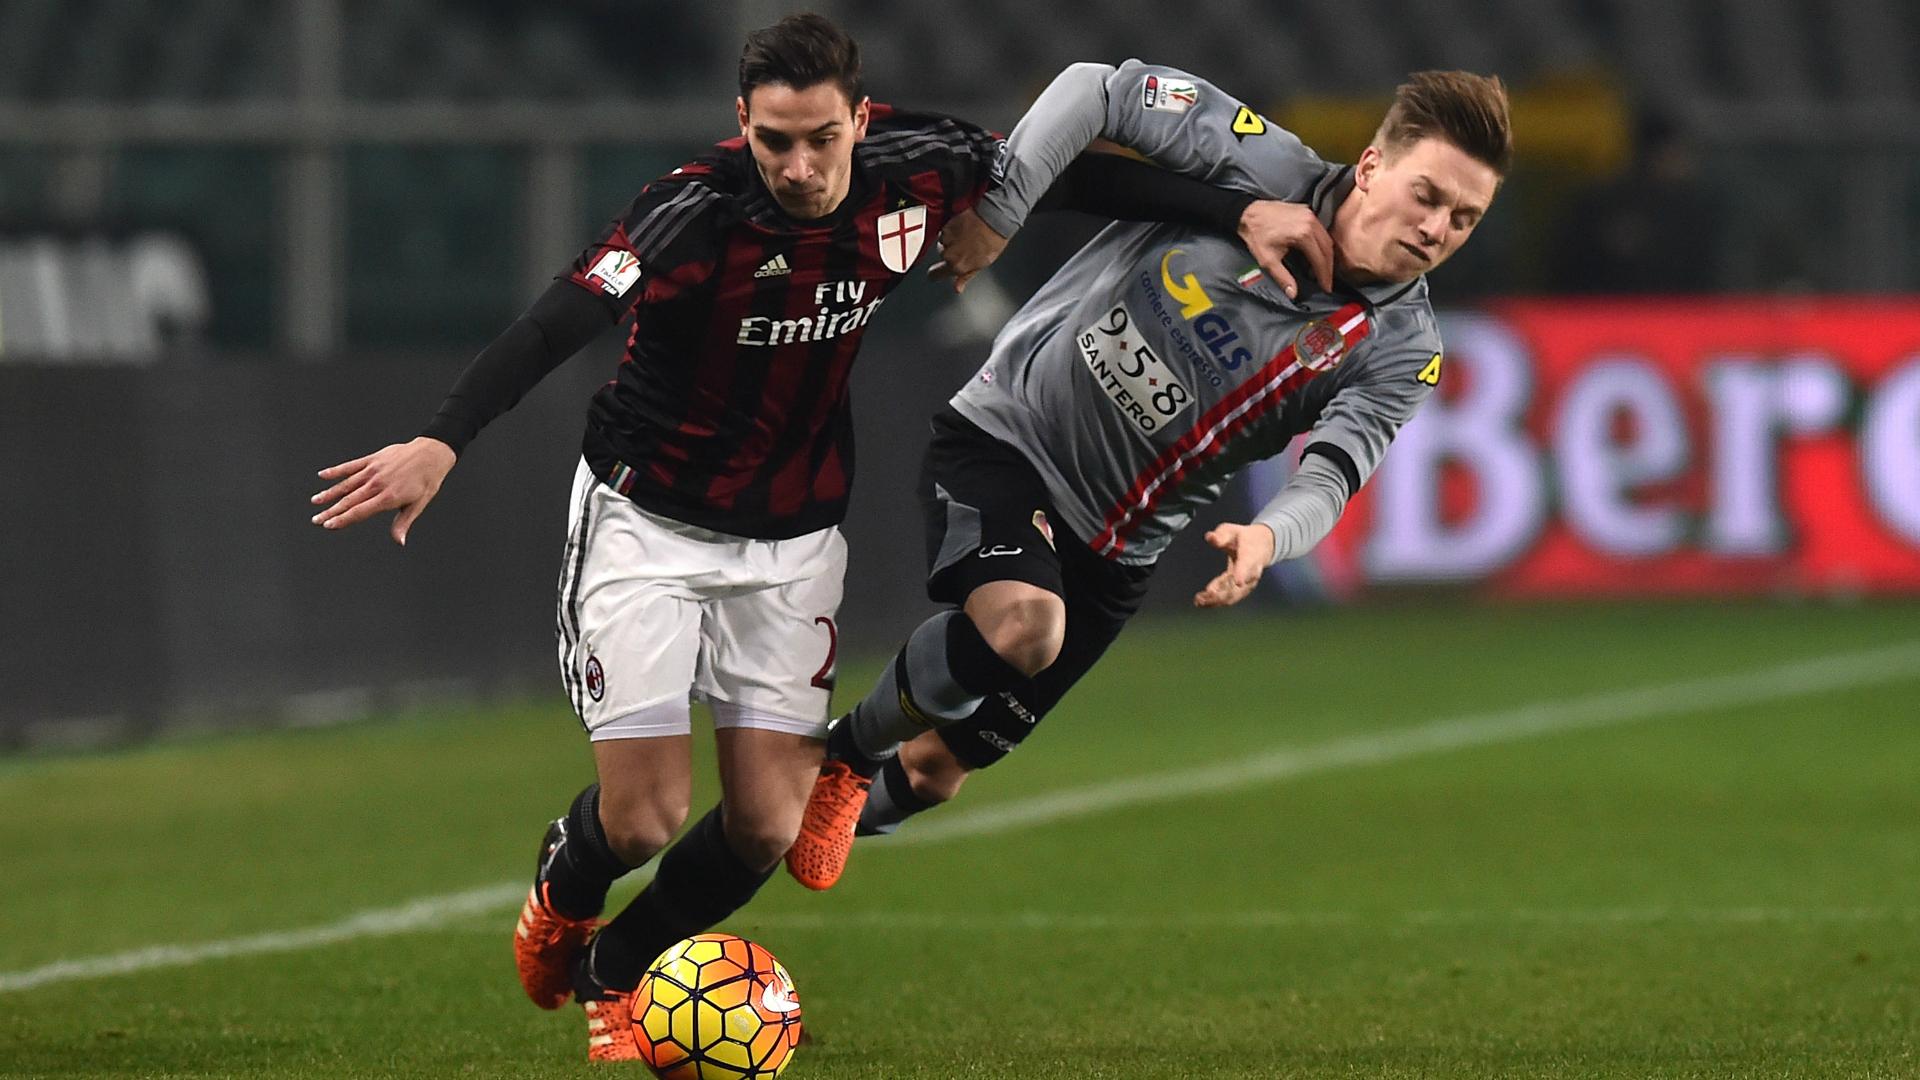 Video: Alessandria vs AC Milan